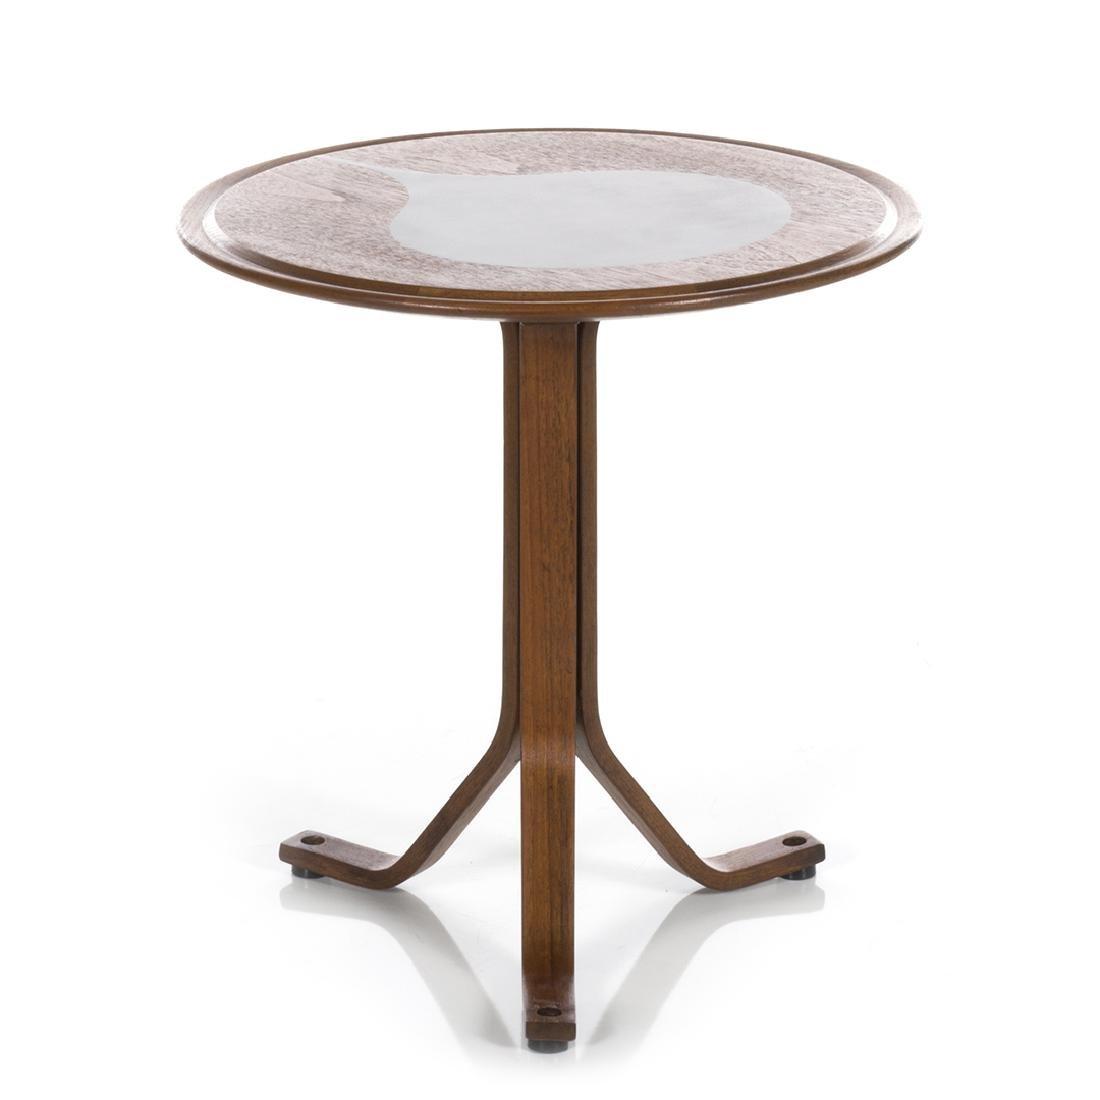 Selig Teak Side Table - 2